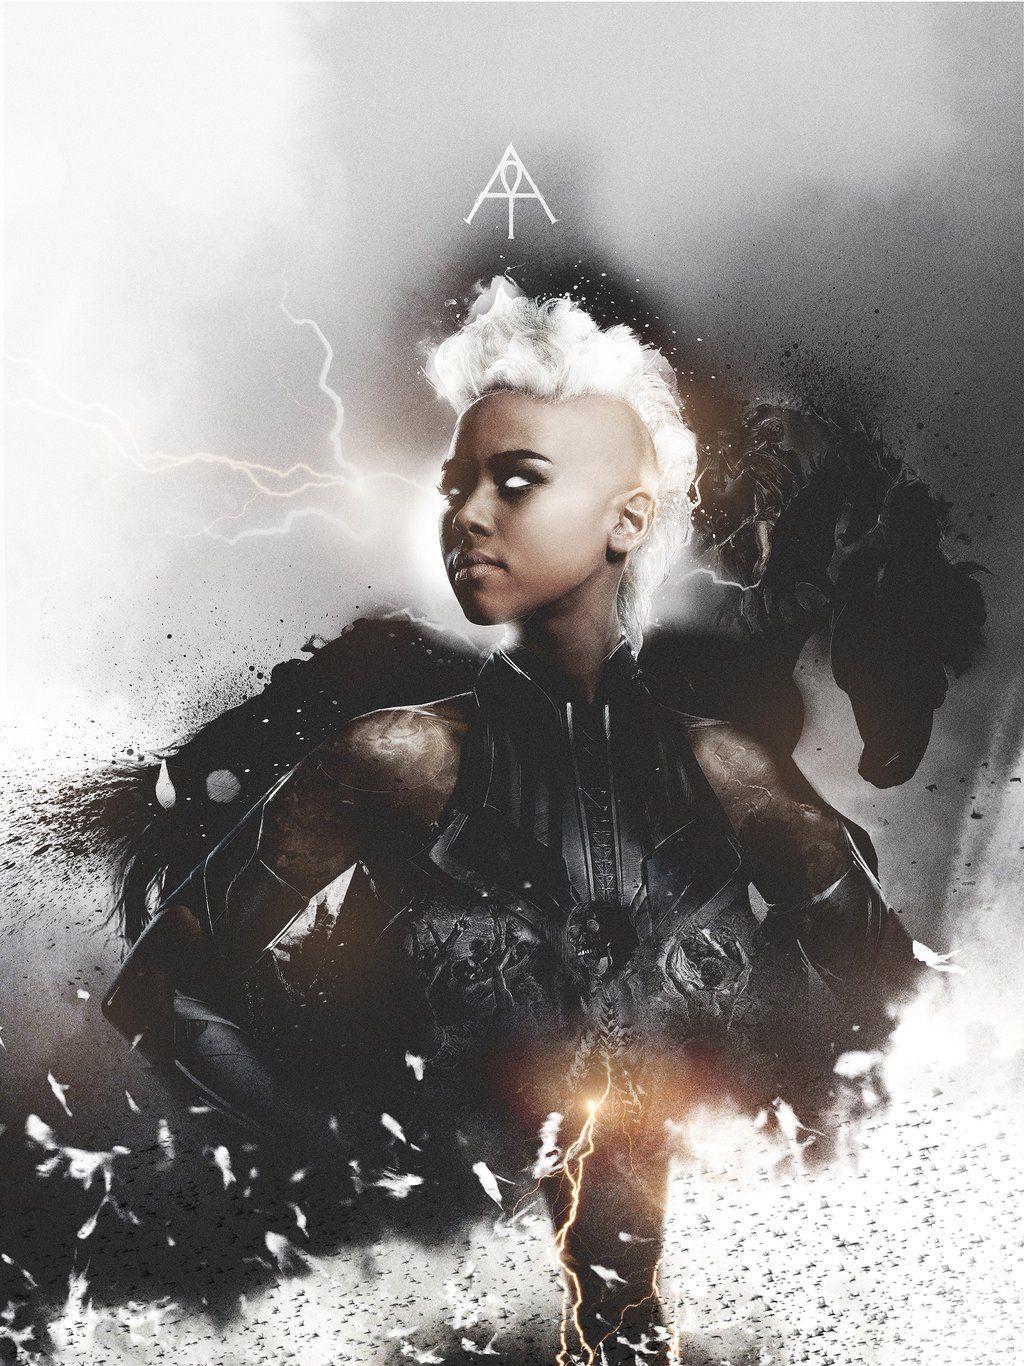 Alexandra Shipp Illustration: X-Men